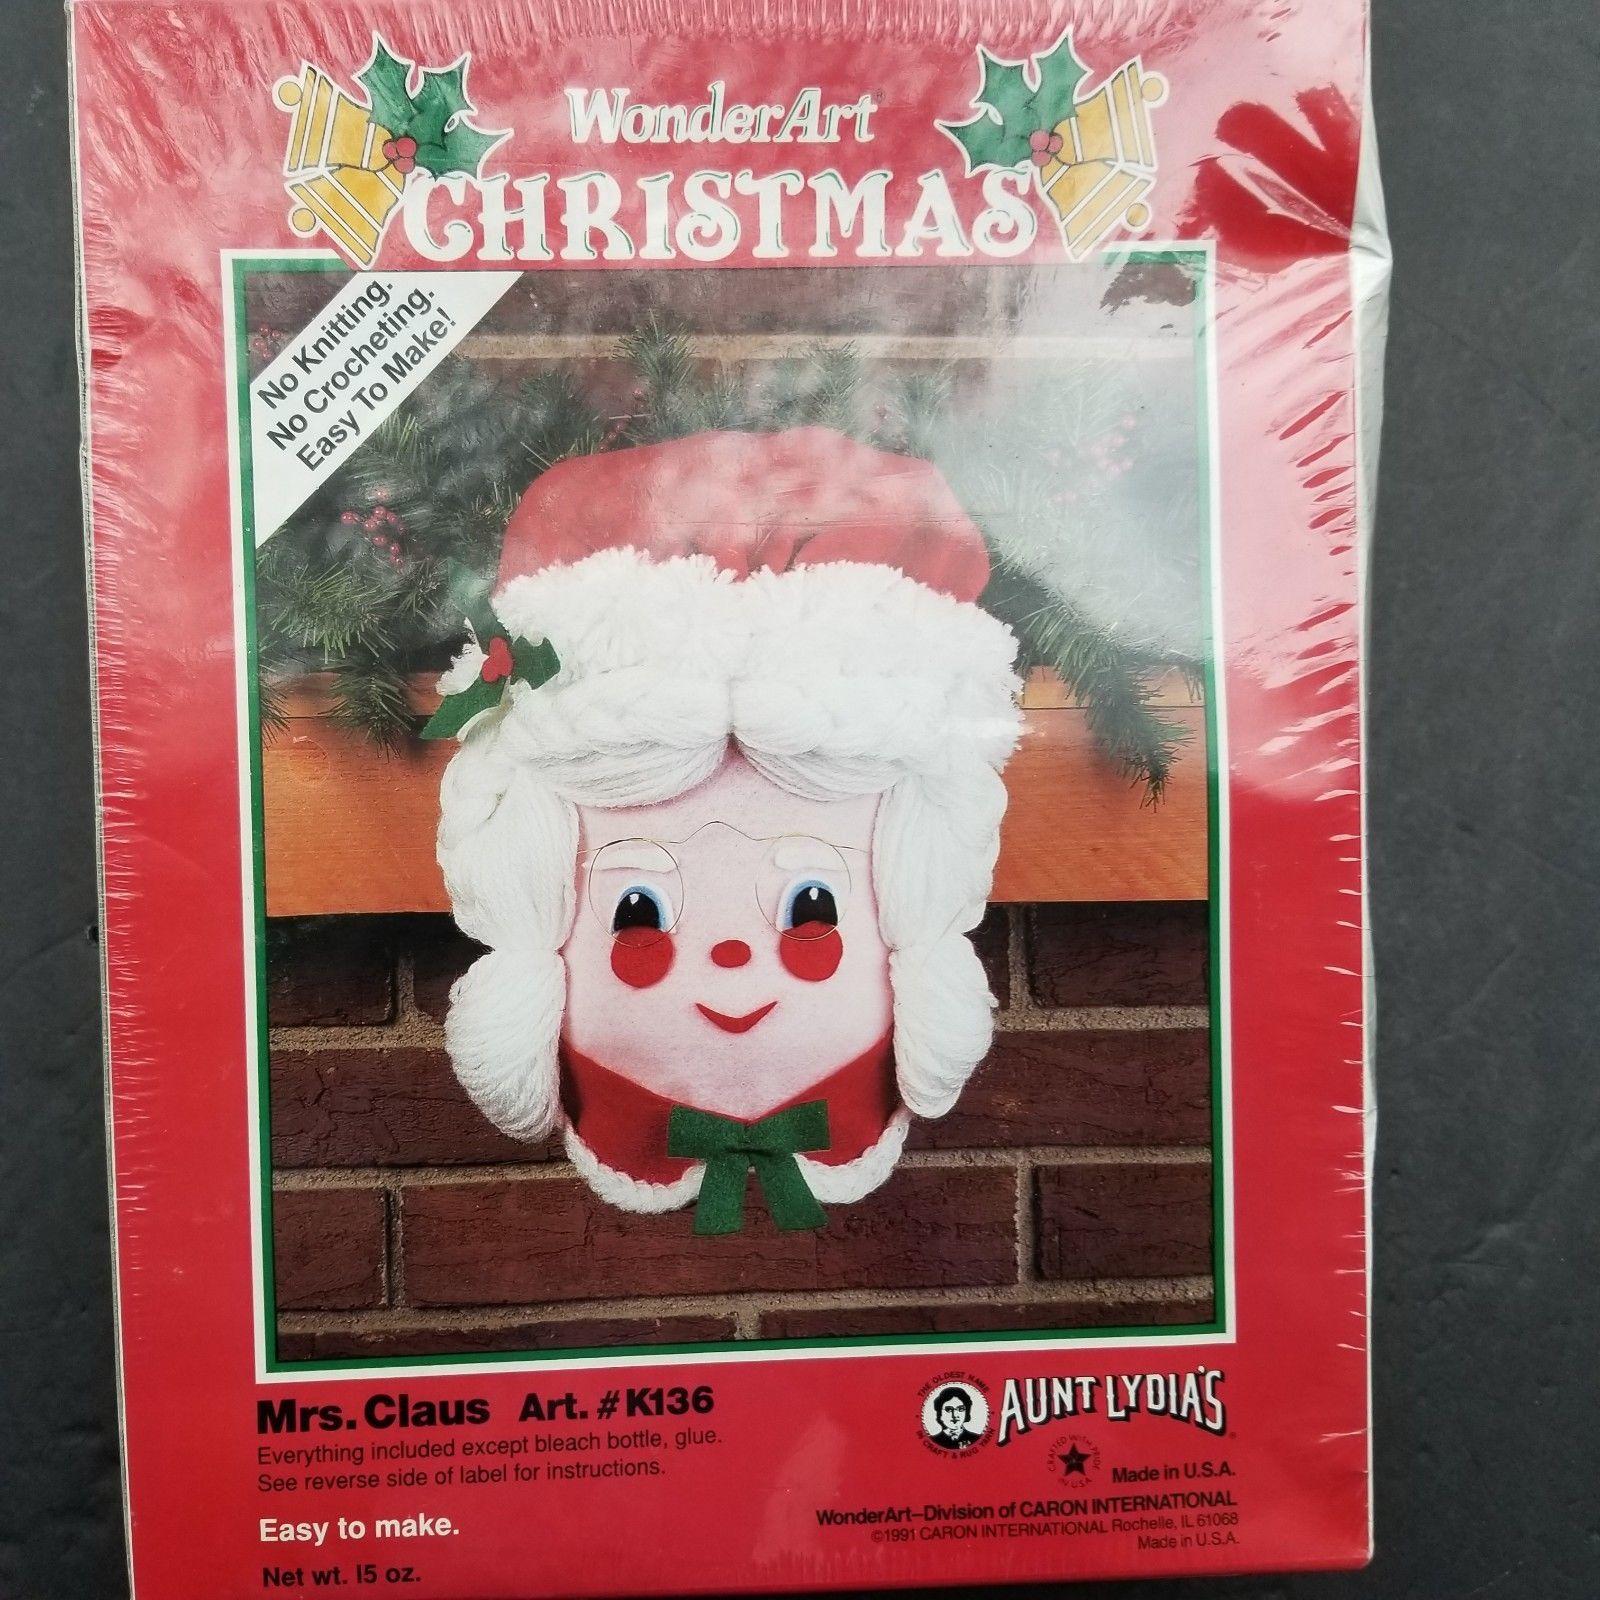 Aunt Lydia's Mrs. Claus Craft Kit WonderArt Christmas - $20.90